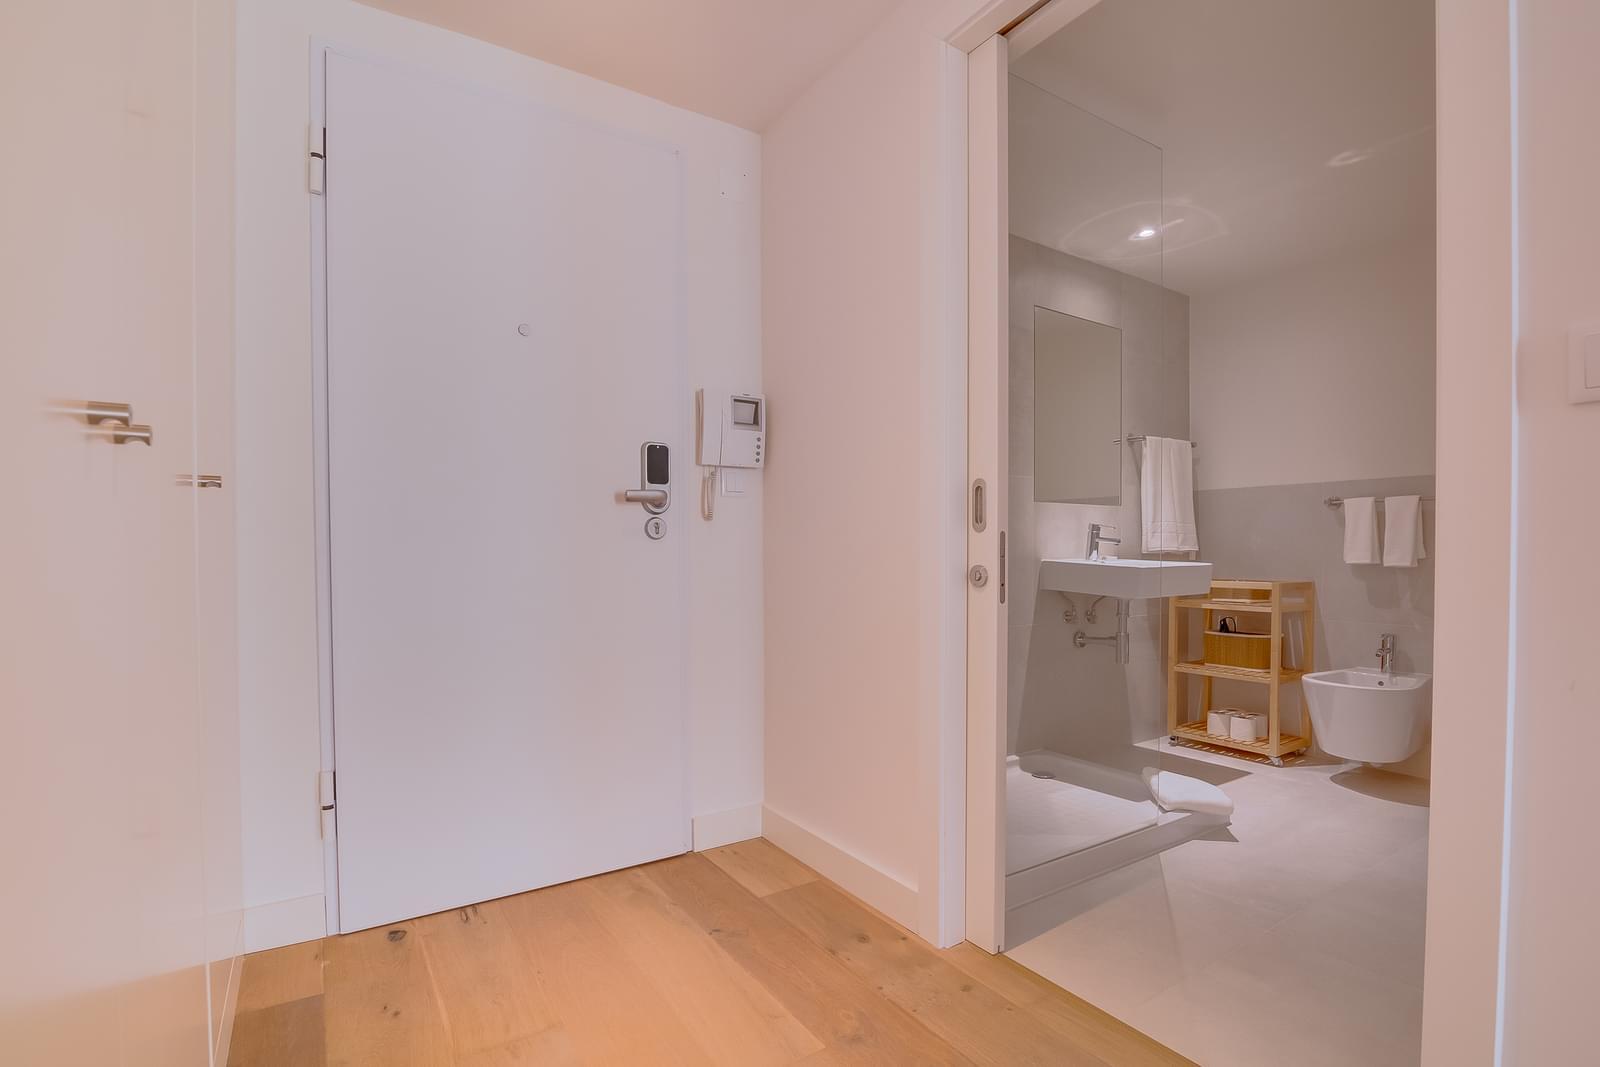 pf16967-apartamento-t0-lisboa-0bc1d16f-592a-4abe-947f-ee0d174a6fd0